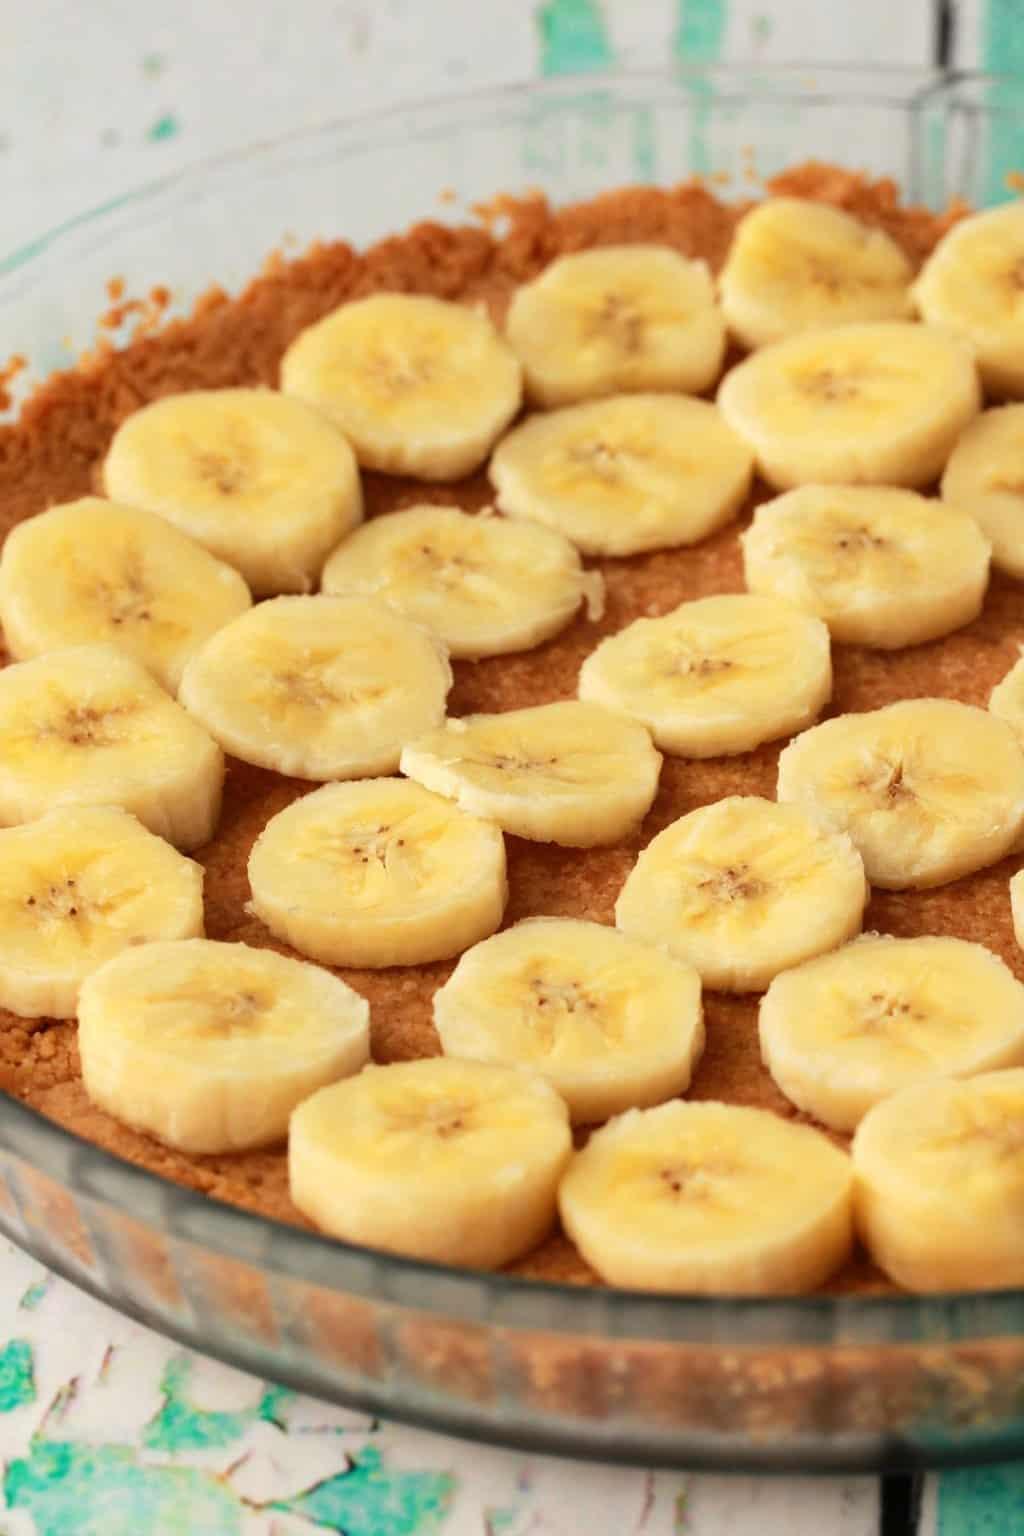 Making a Vegan Banana Cream Pie. #vegan #lovingitvegan #pie #dessert